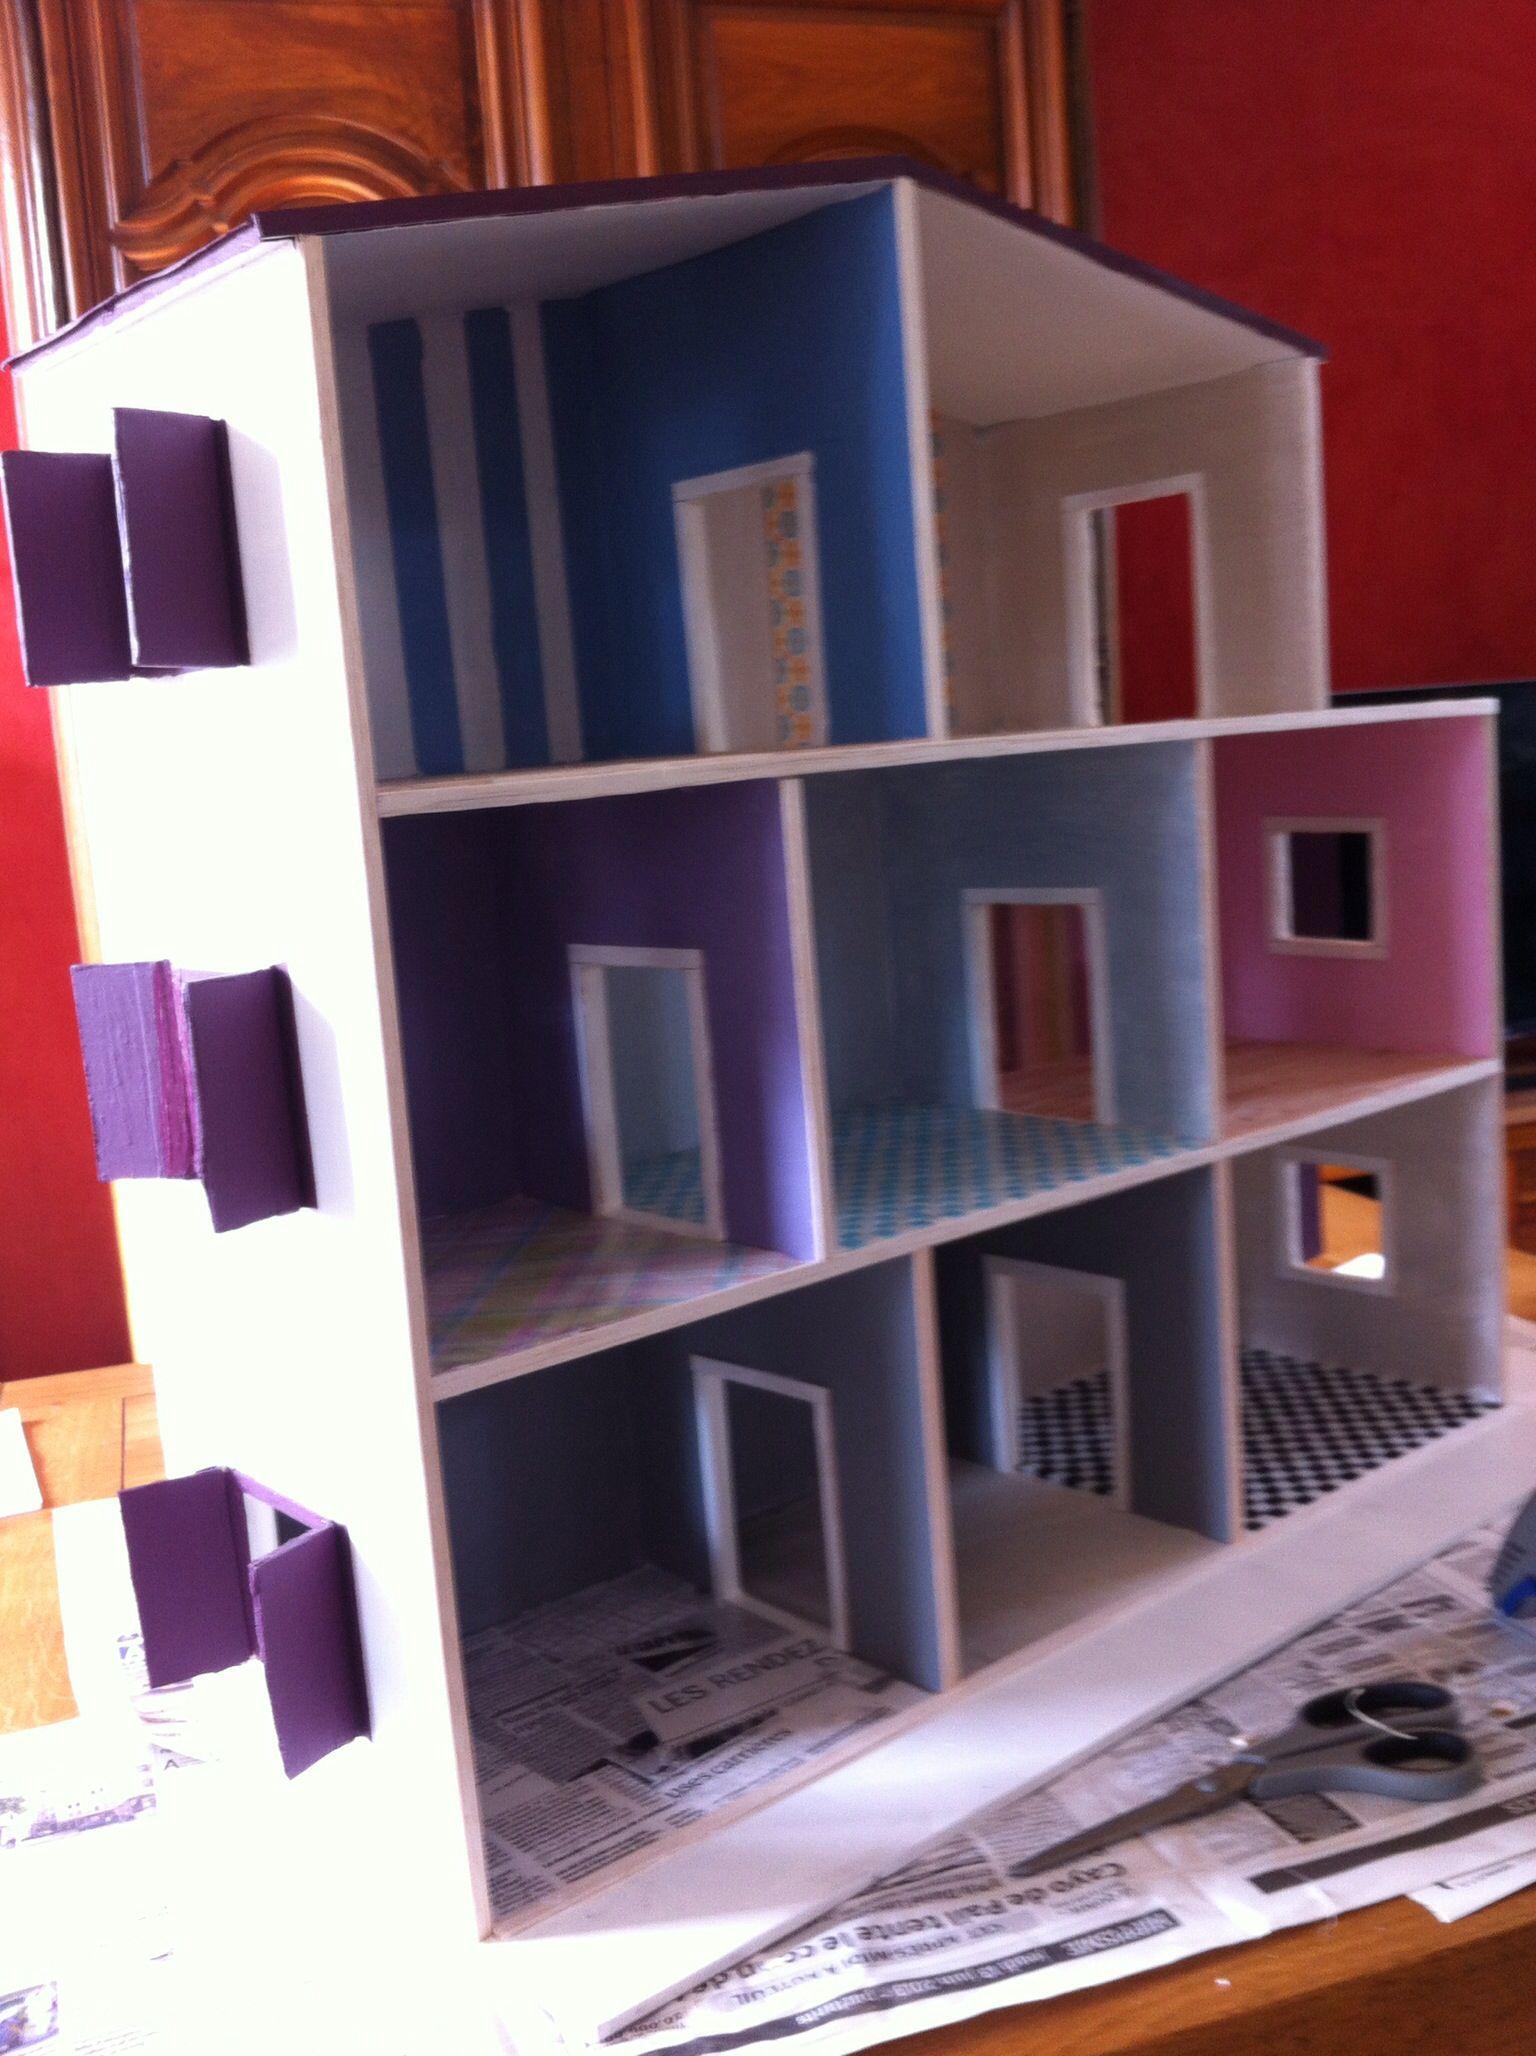 maison playmobile vide mes petites cr ations pinterest. Black Bedroom Furniture Sets. Home Design Ideas